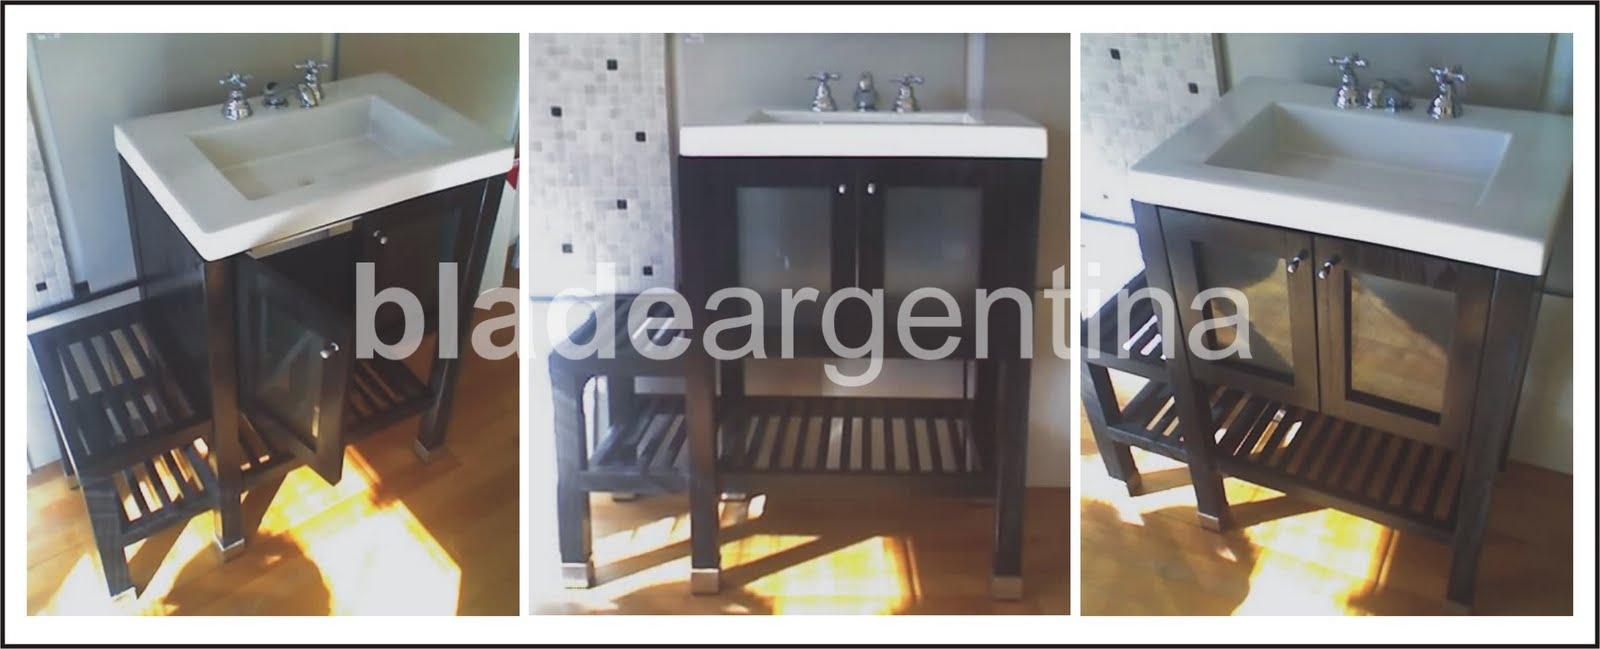 Muebles de blade argentina for Muebles argentina